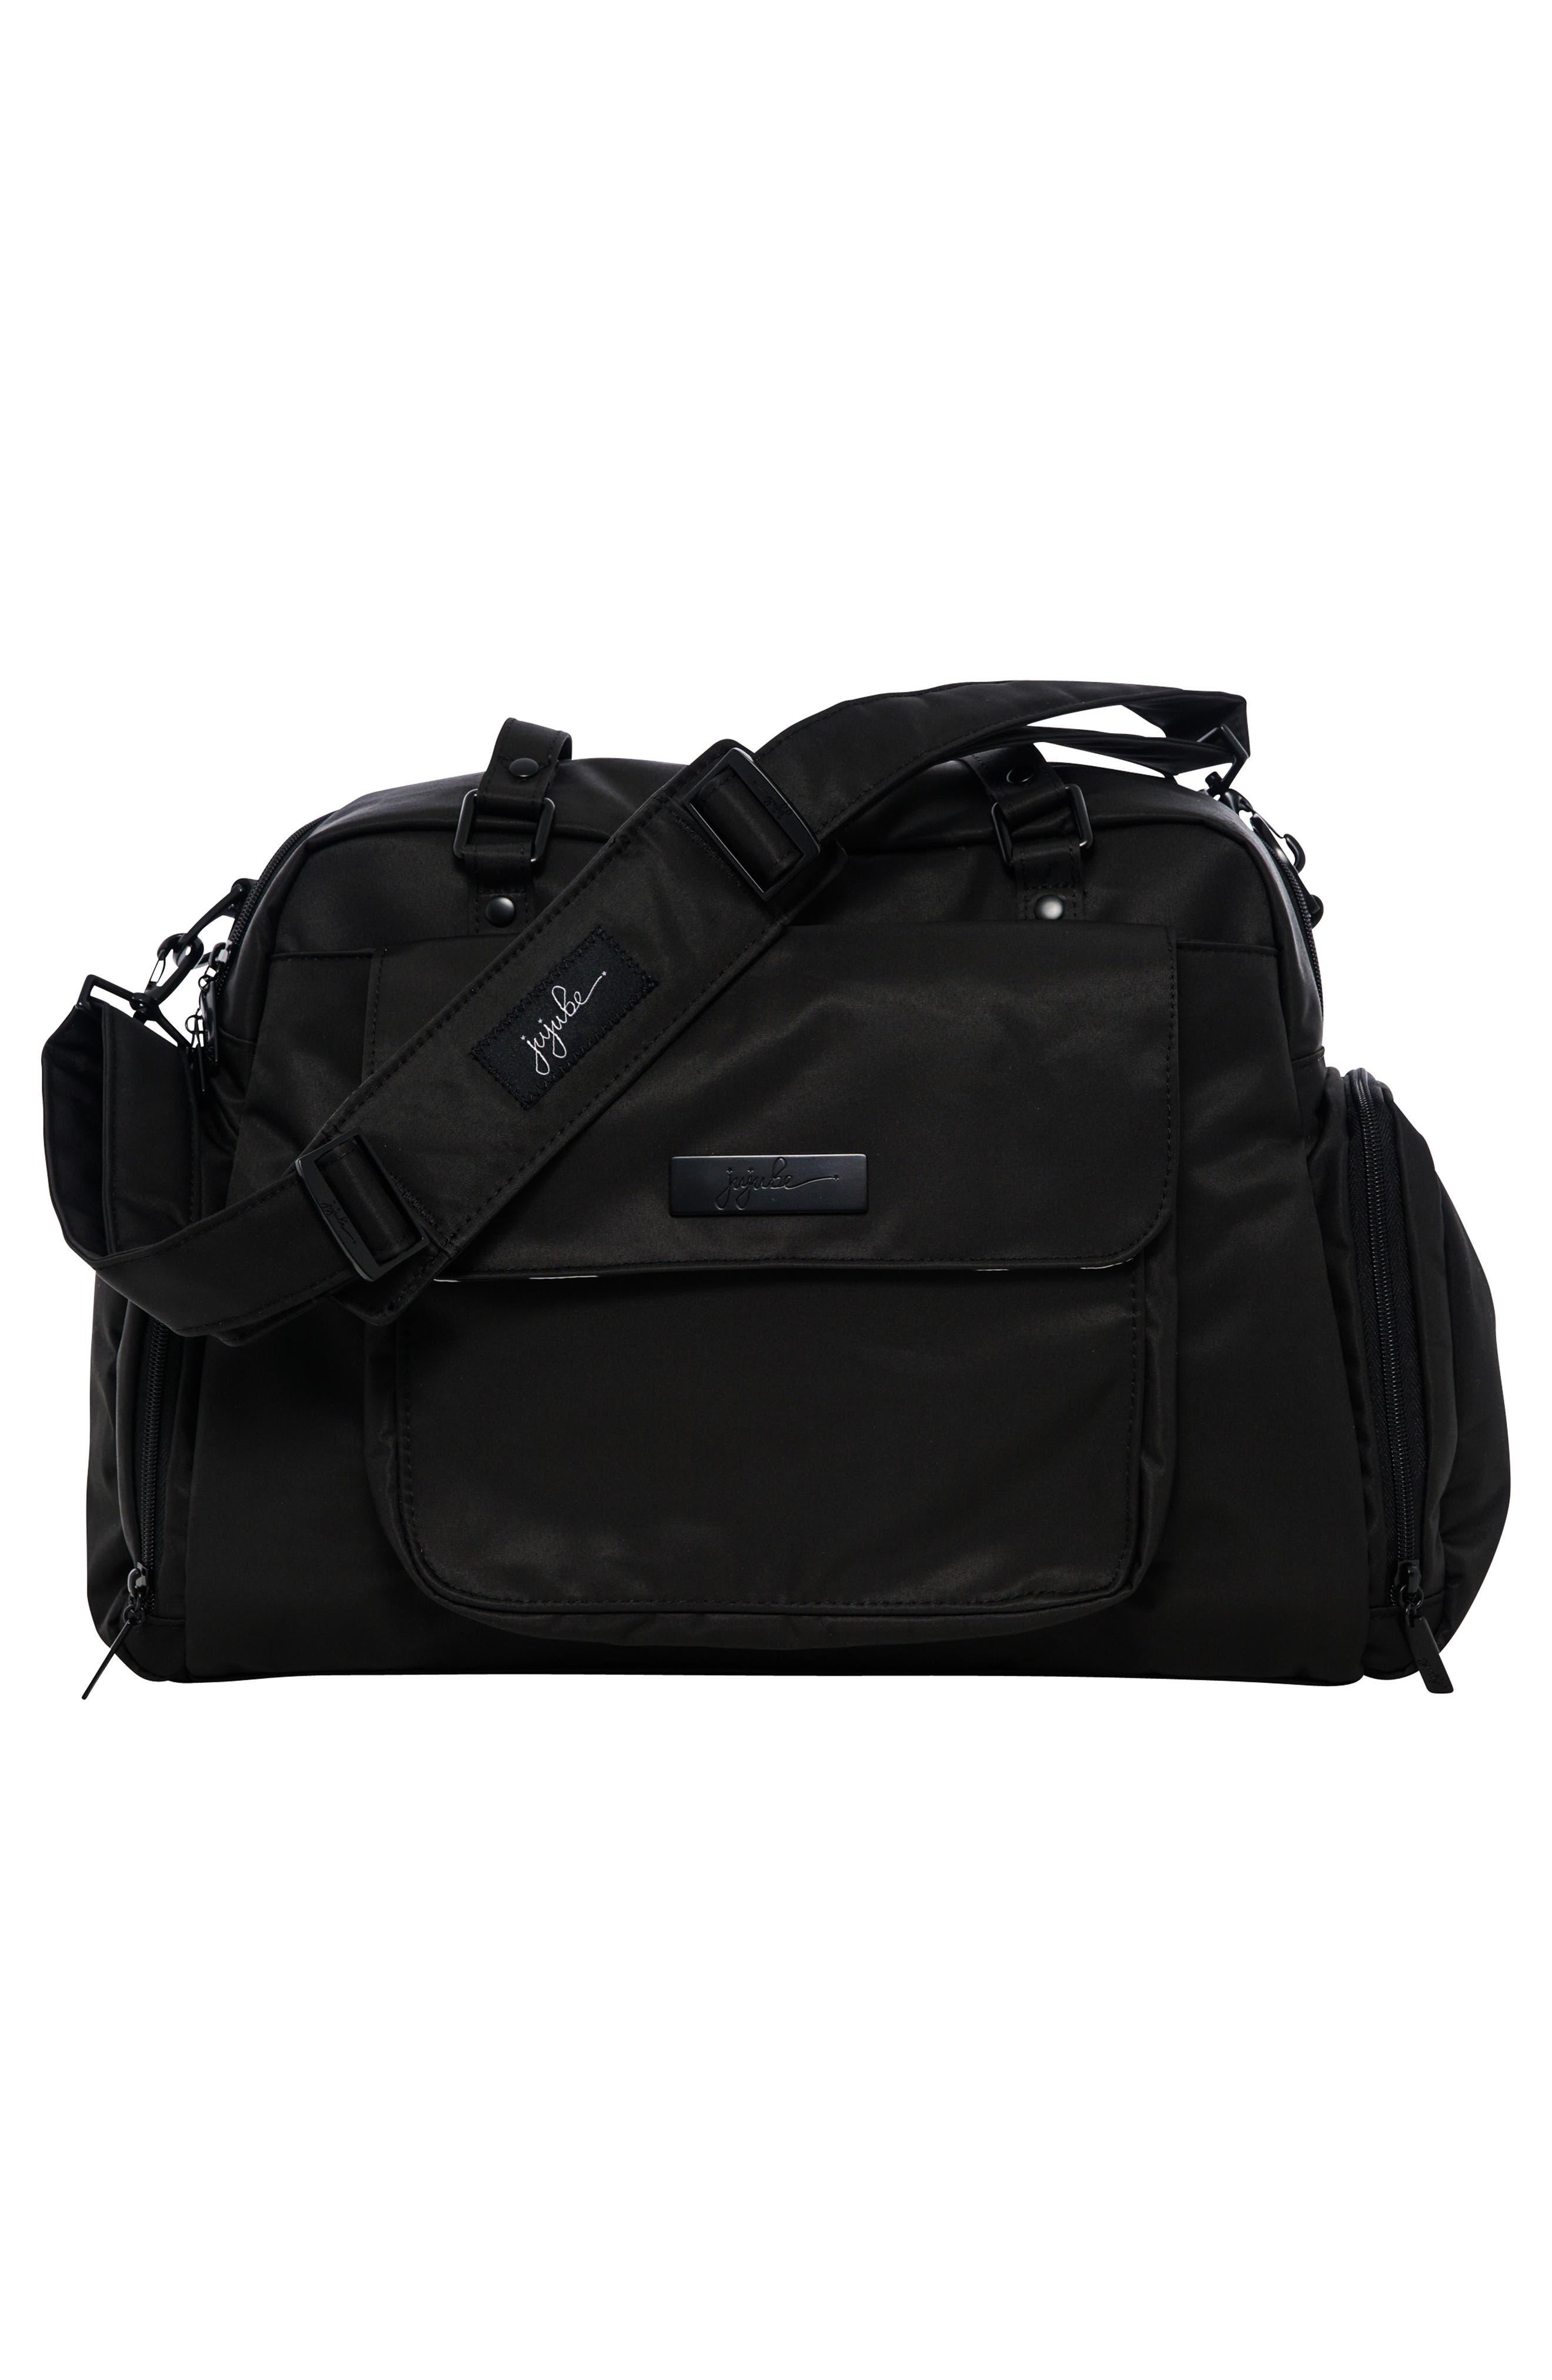 Onyx Be Pumped Bag,                             Alternate thumbnail 5, color,                             001